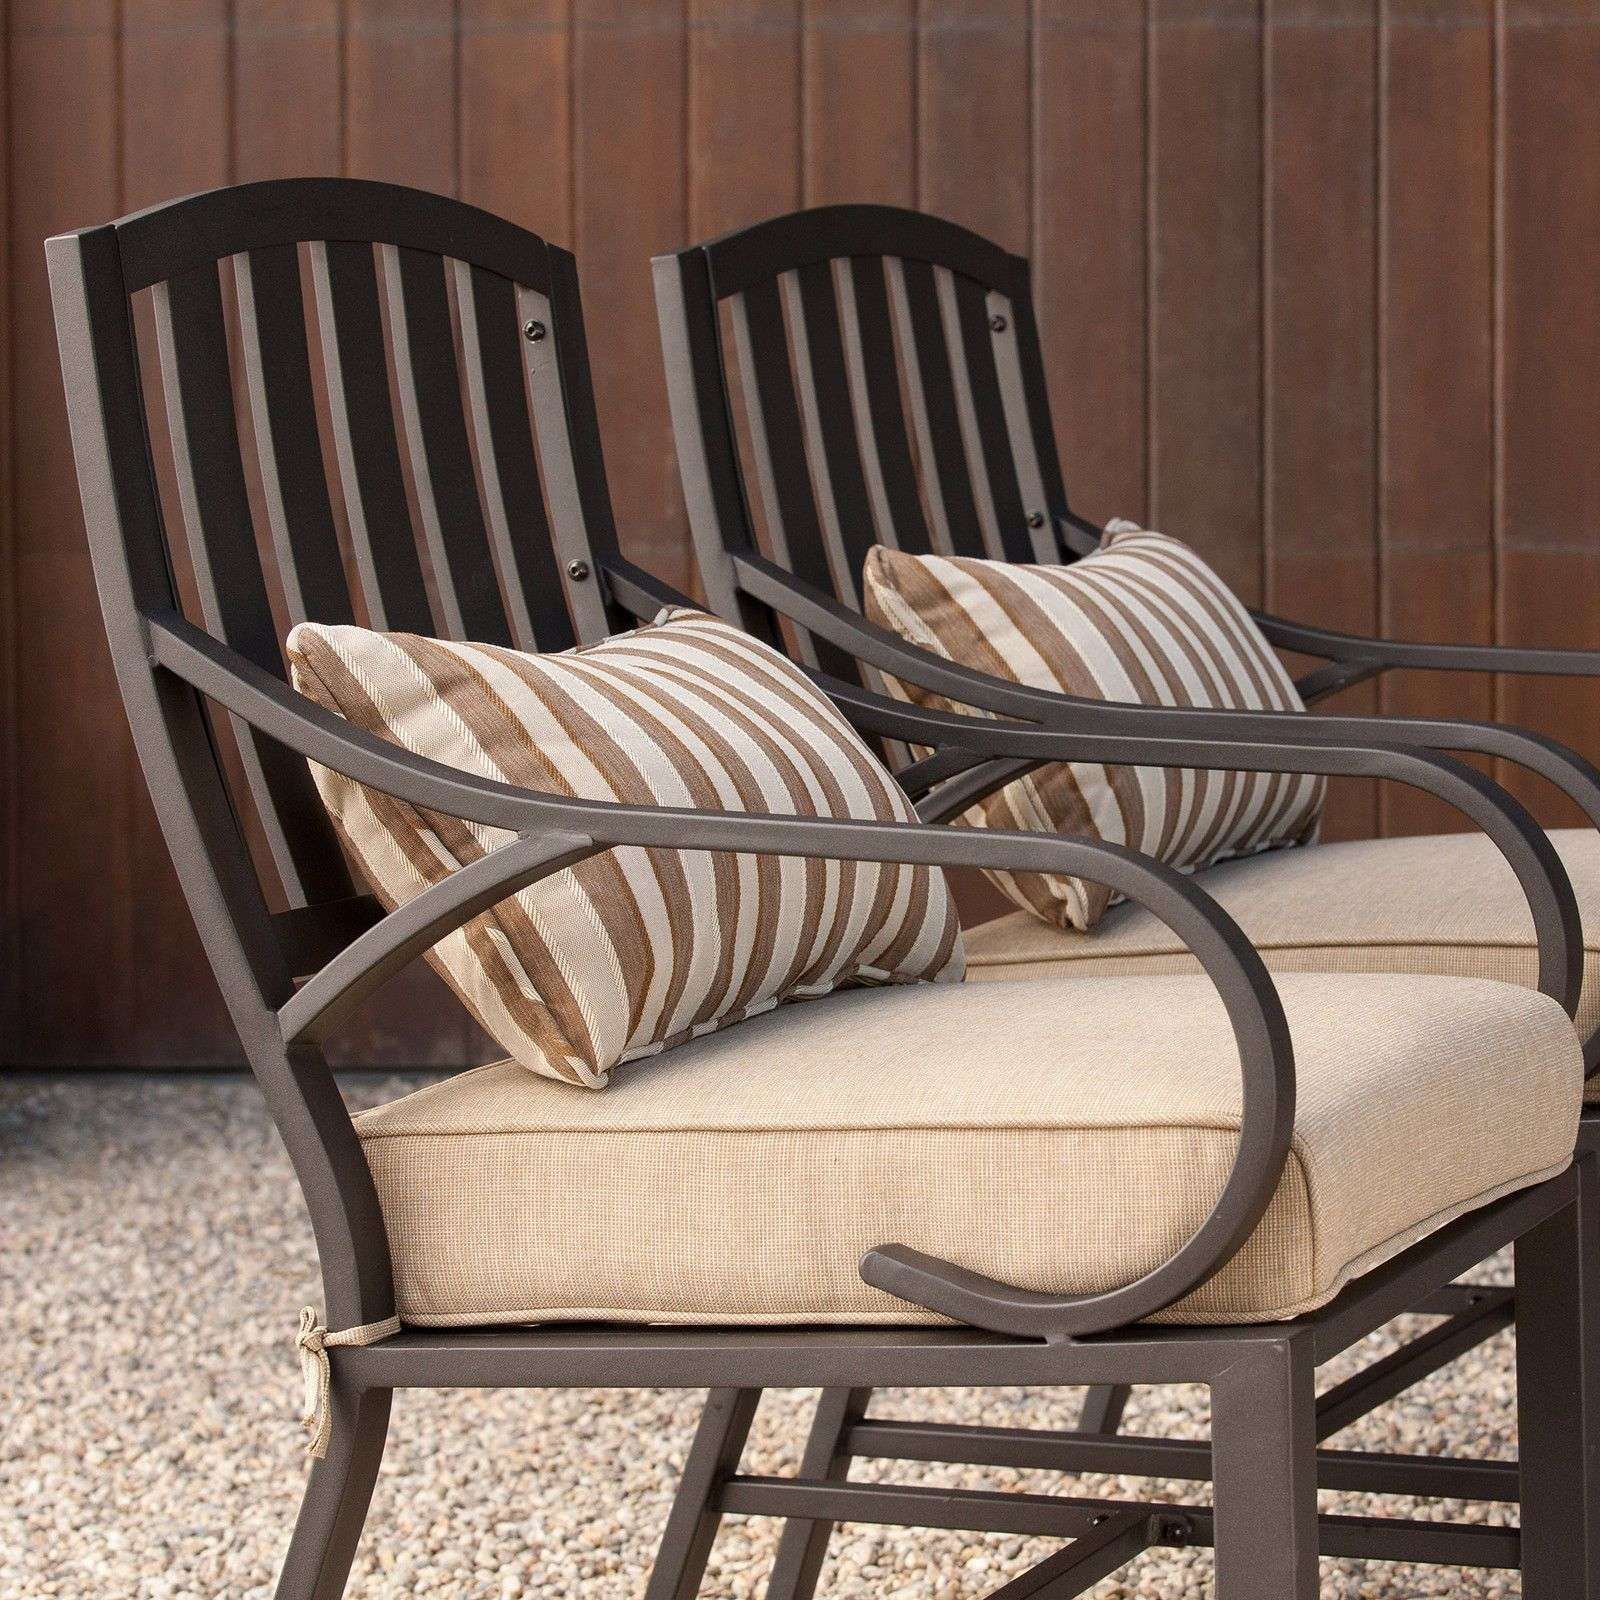 Attrayant Patio Furniture Sets Clearance 7 Piece Cushion Dining Aluminum Swivel  Rockers   EBay